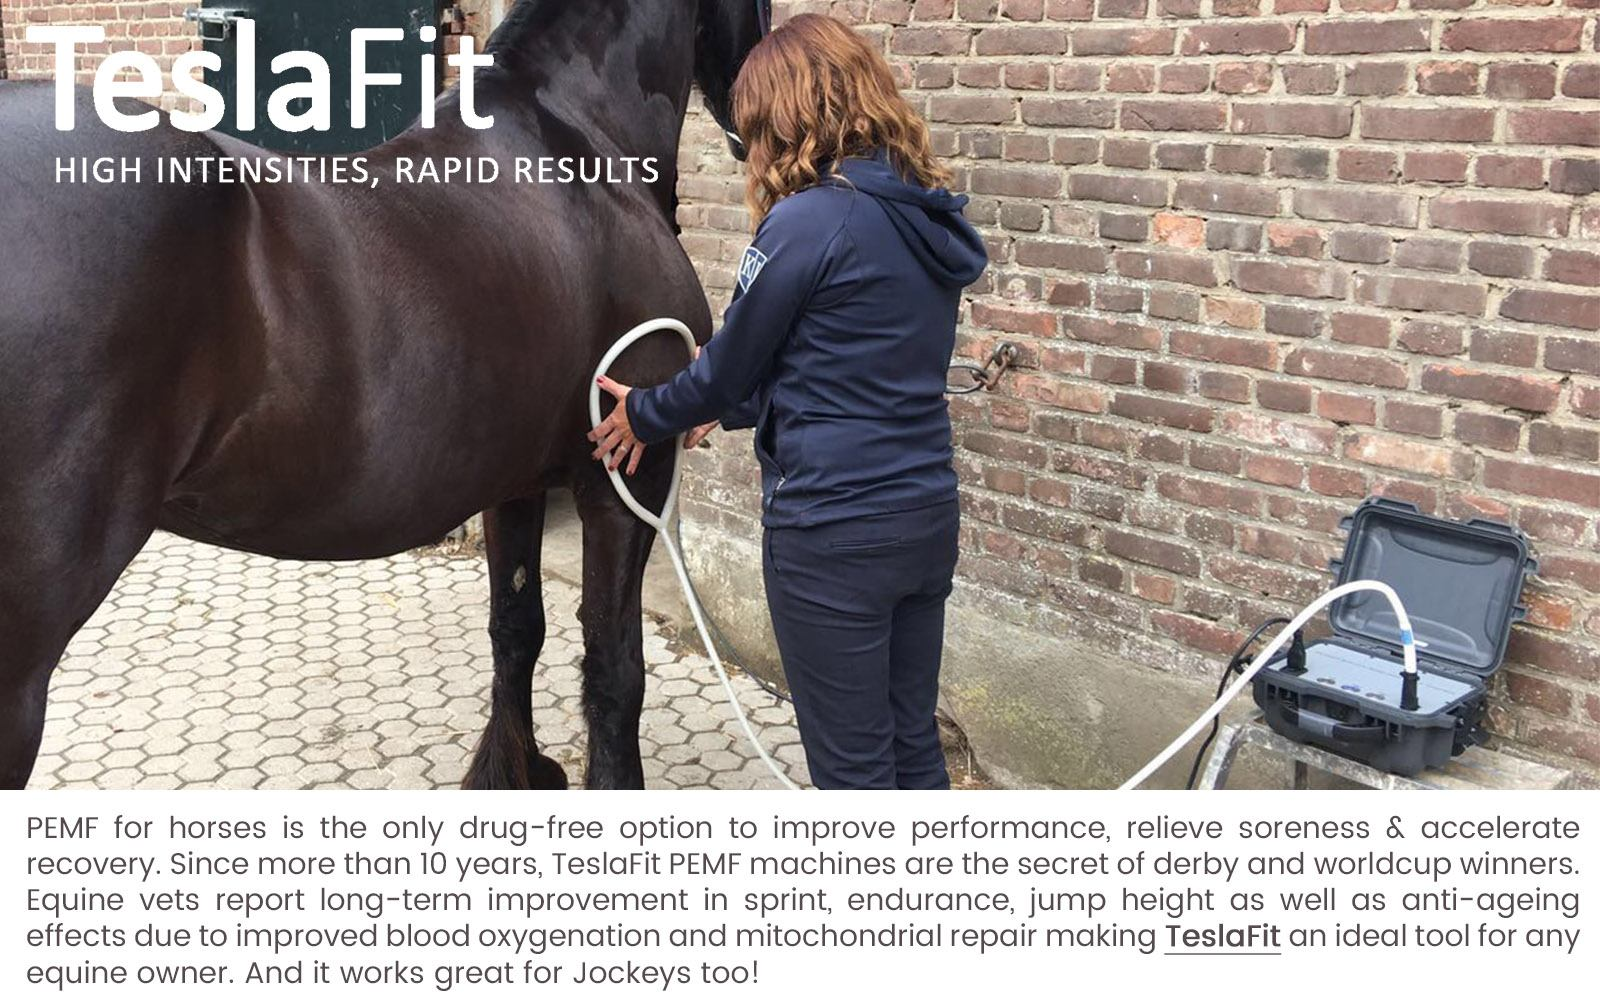 PEMF therapy for Equines - TeslaFit PEMF